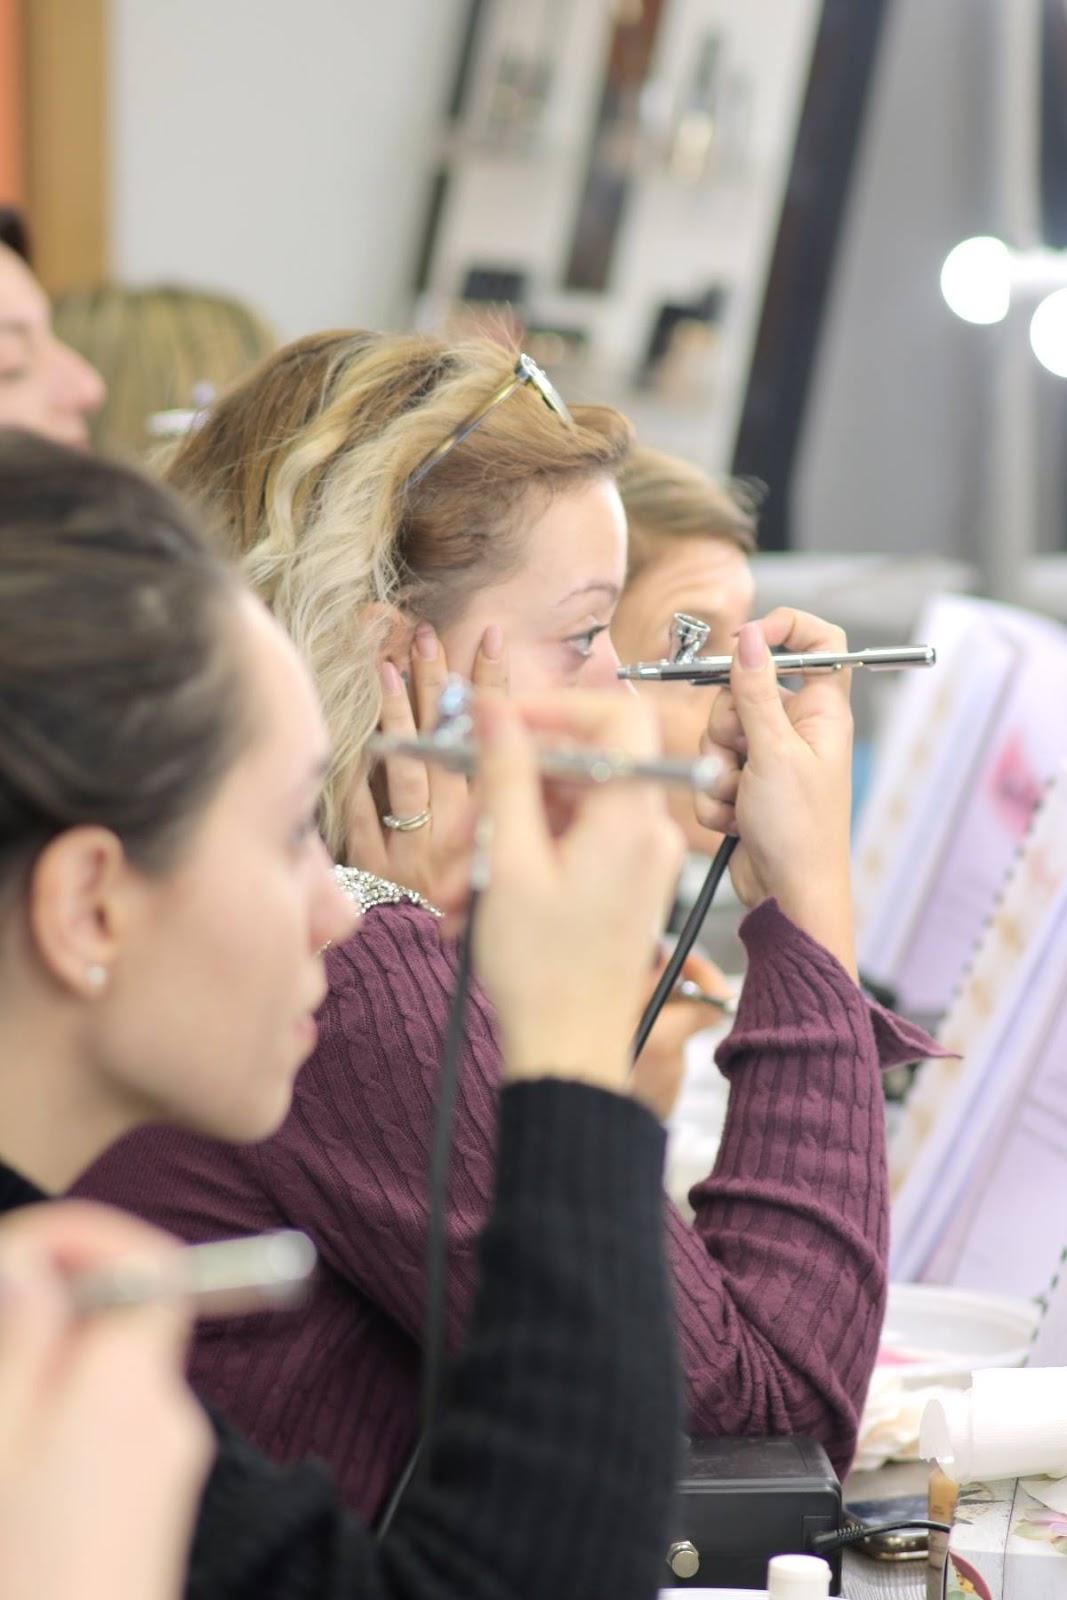 The Airbrush Makeup Guru